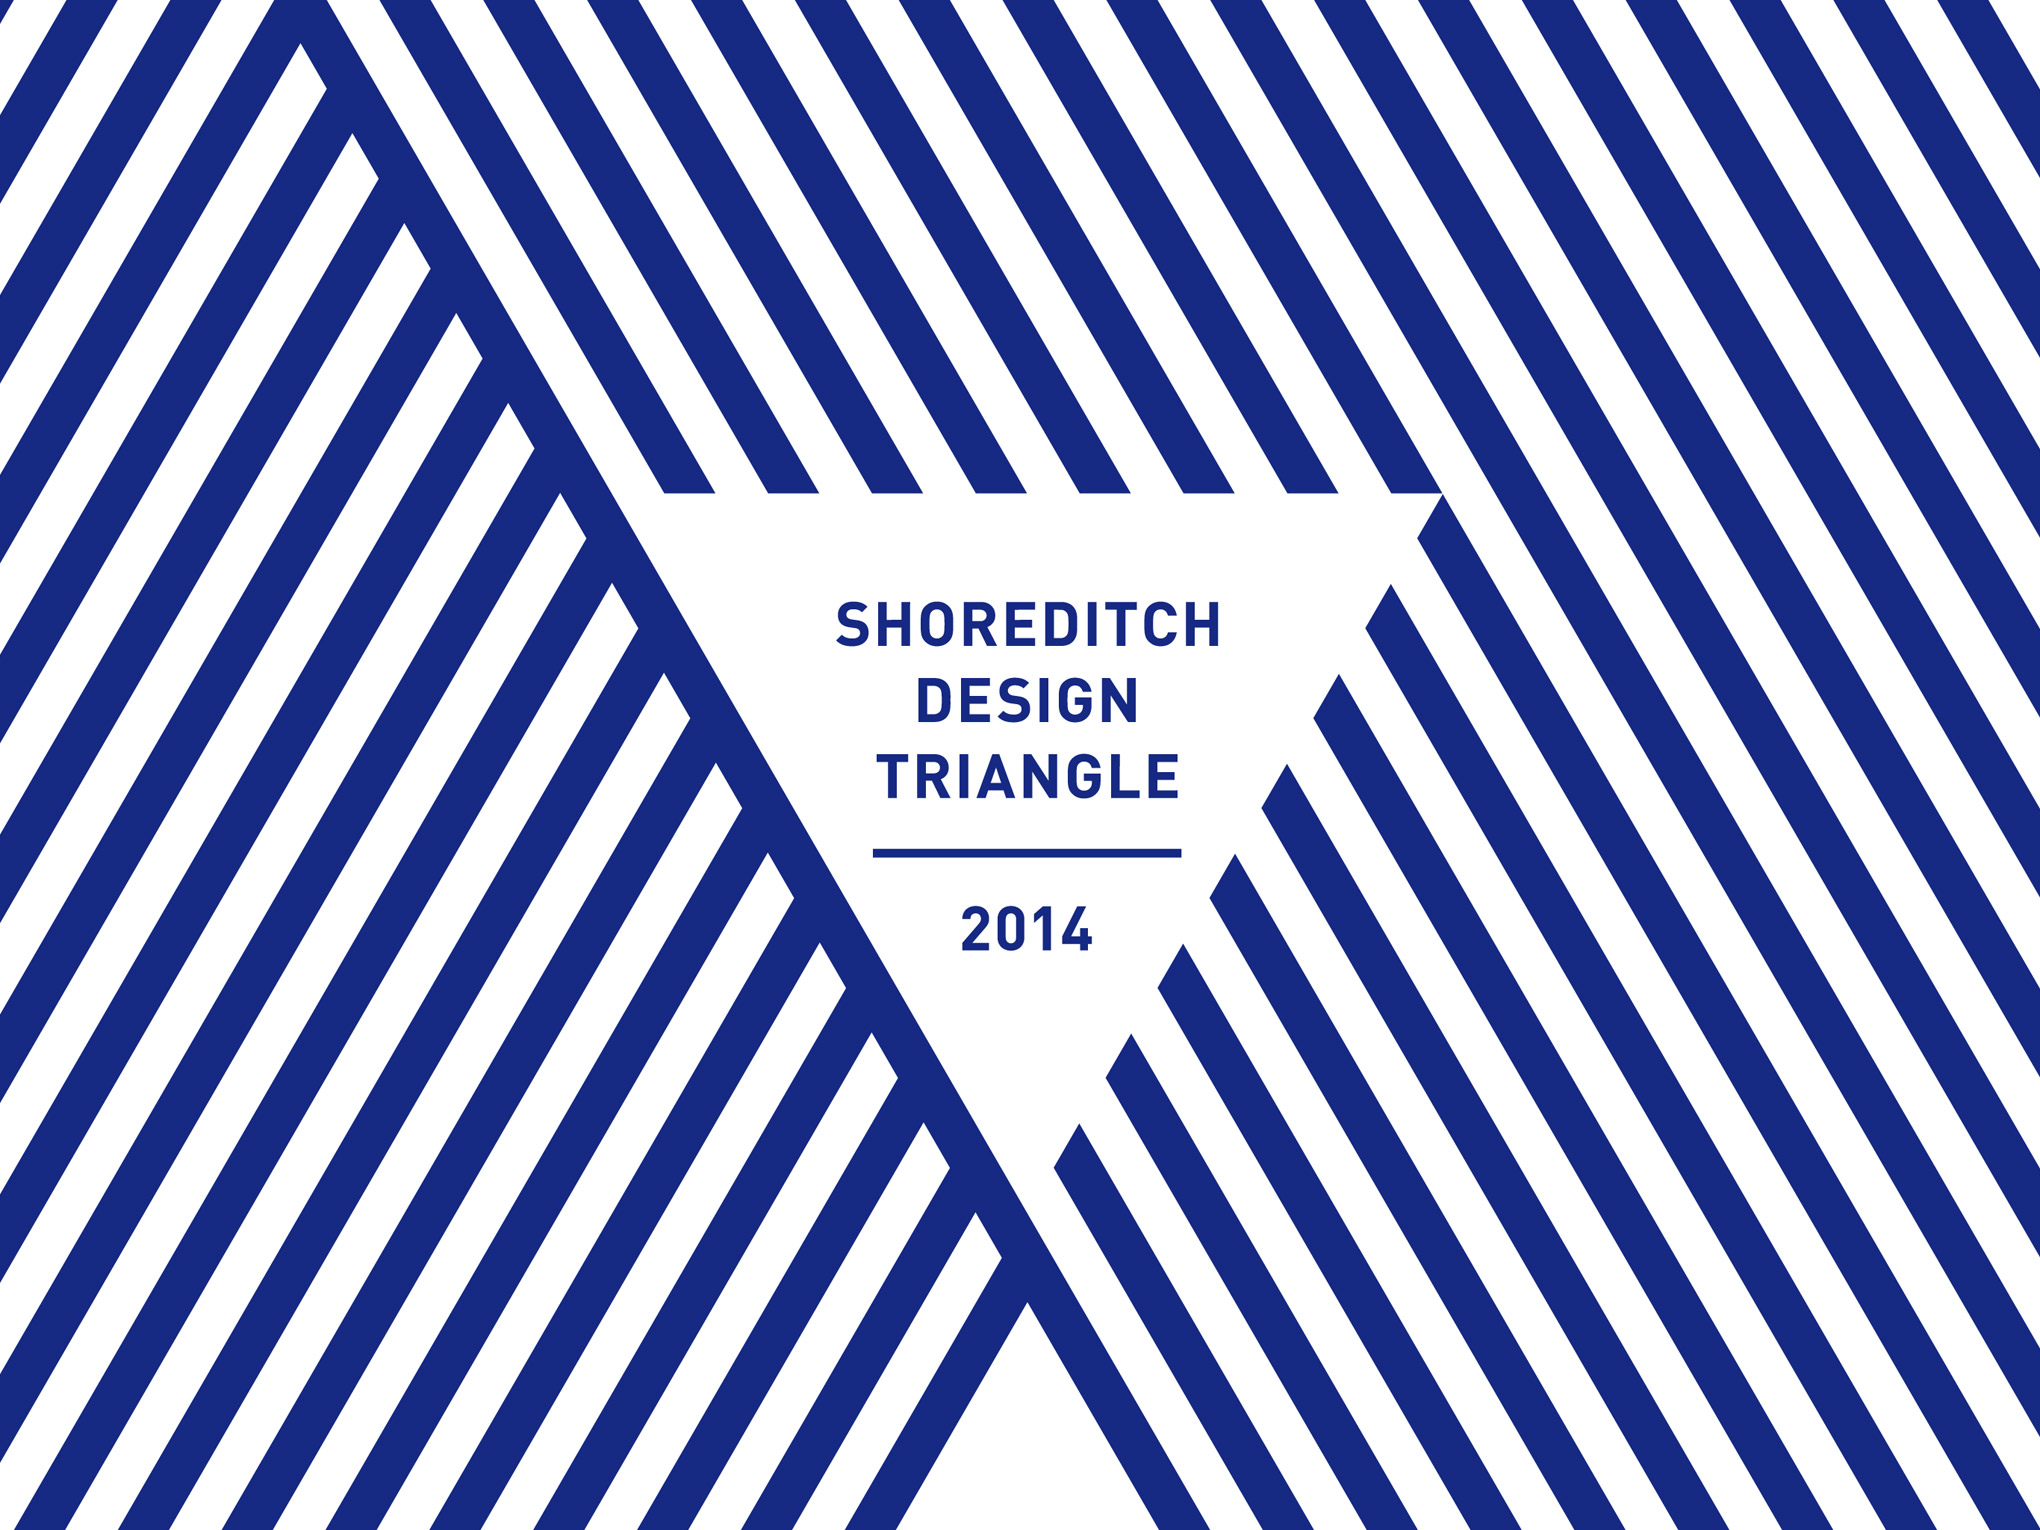 ShoreditchDesignTriangle_1